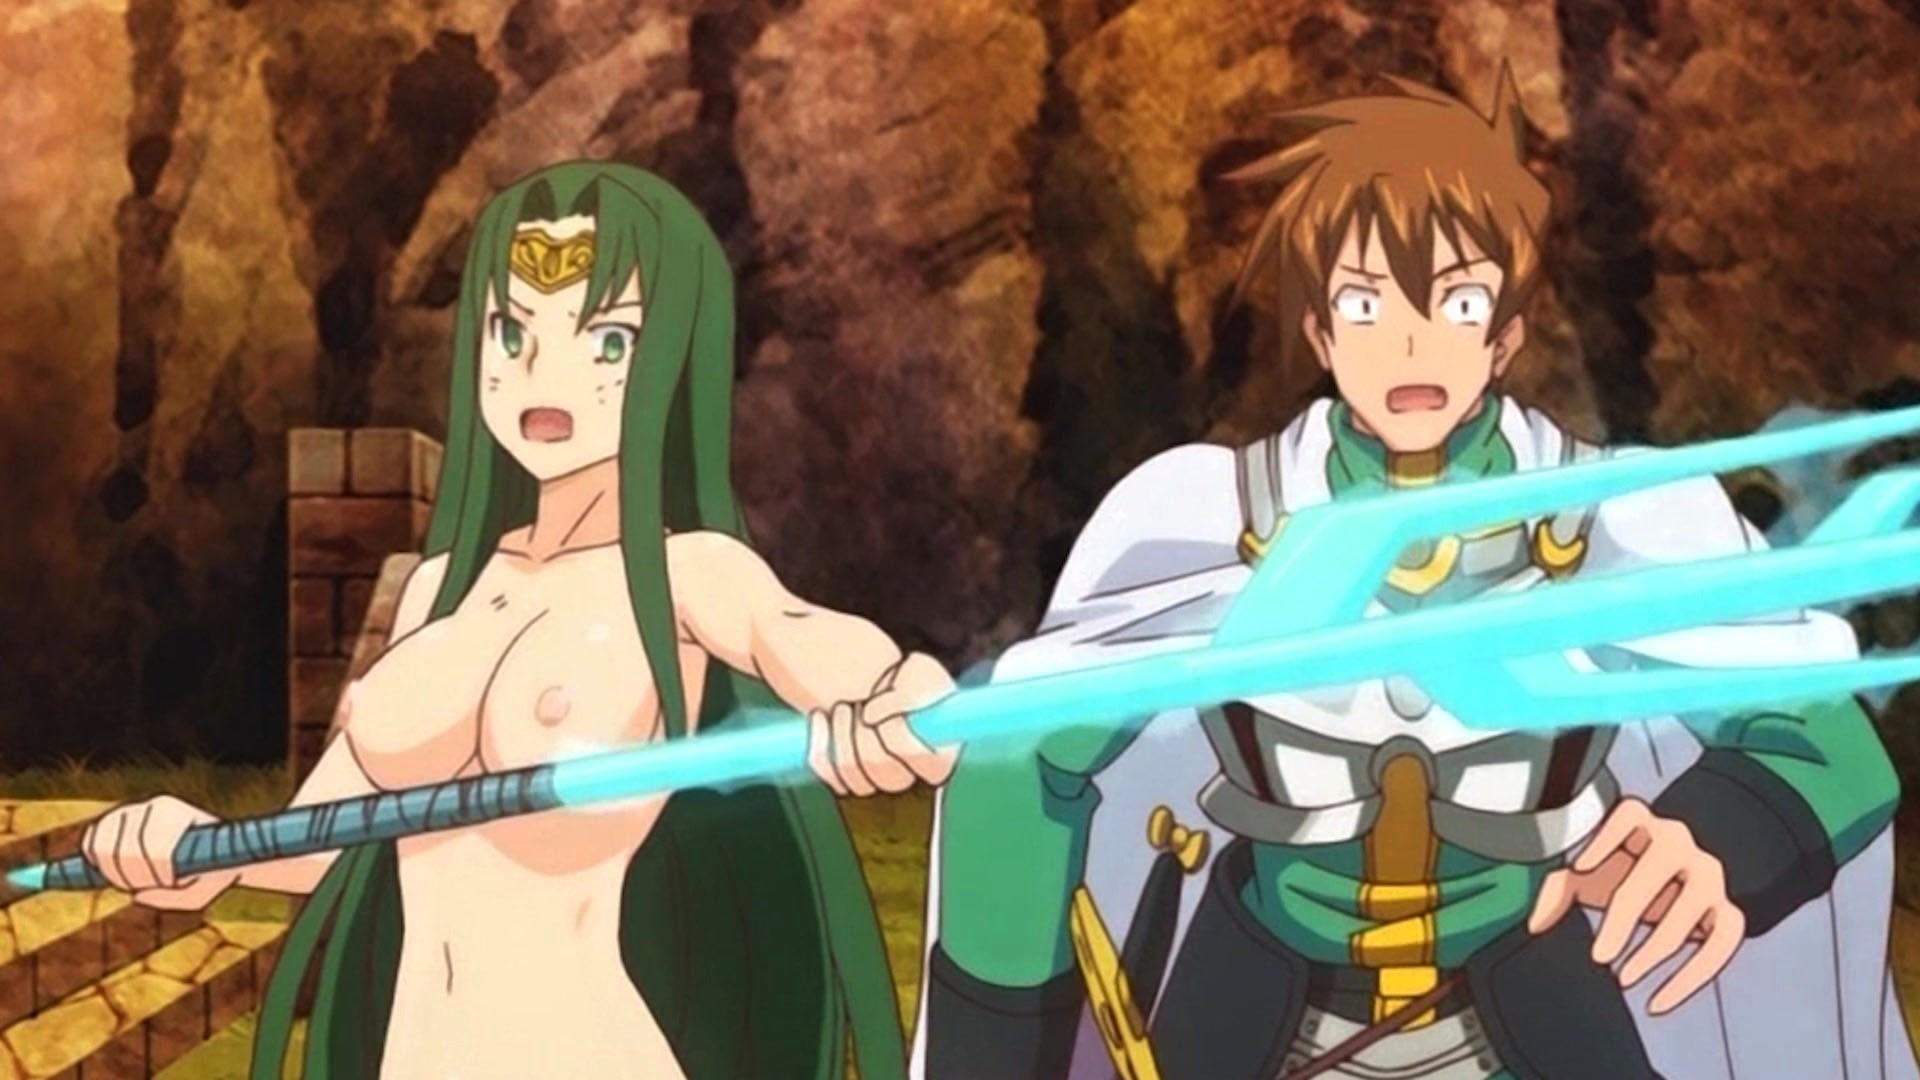 Rance: The Quest for Hikari - Hentai Pros